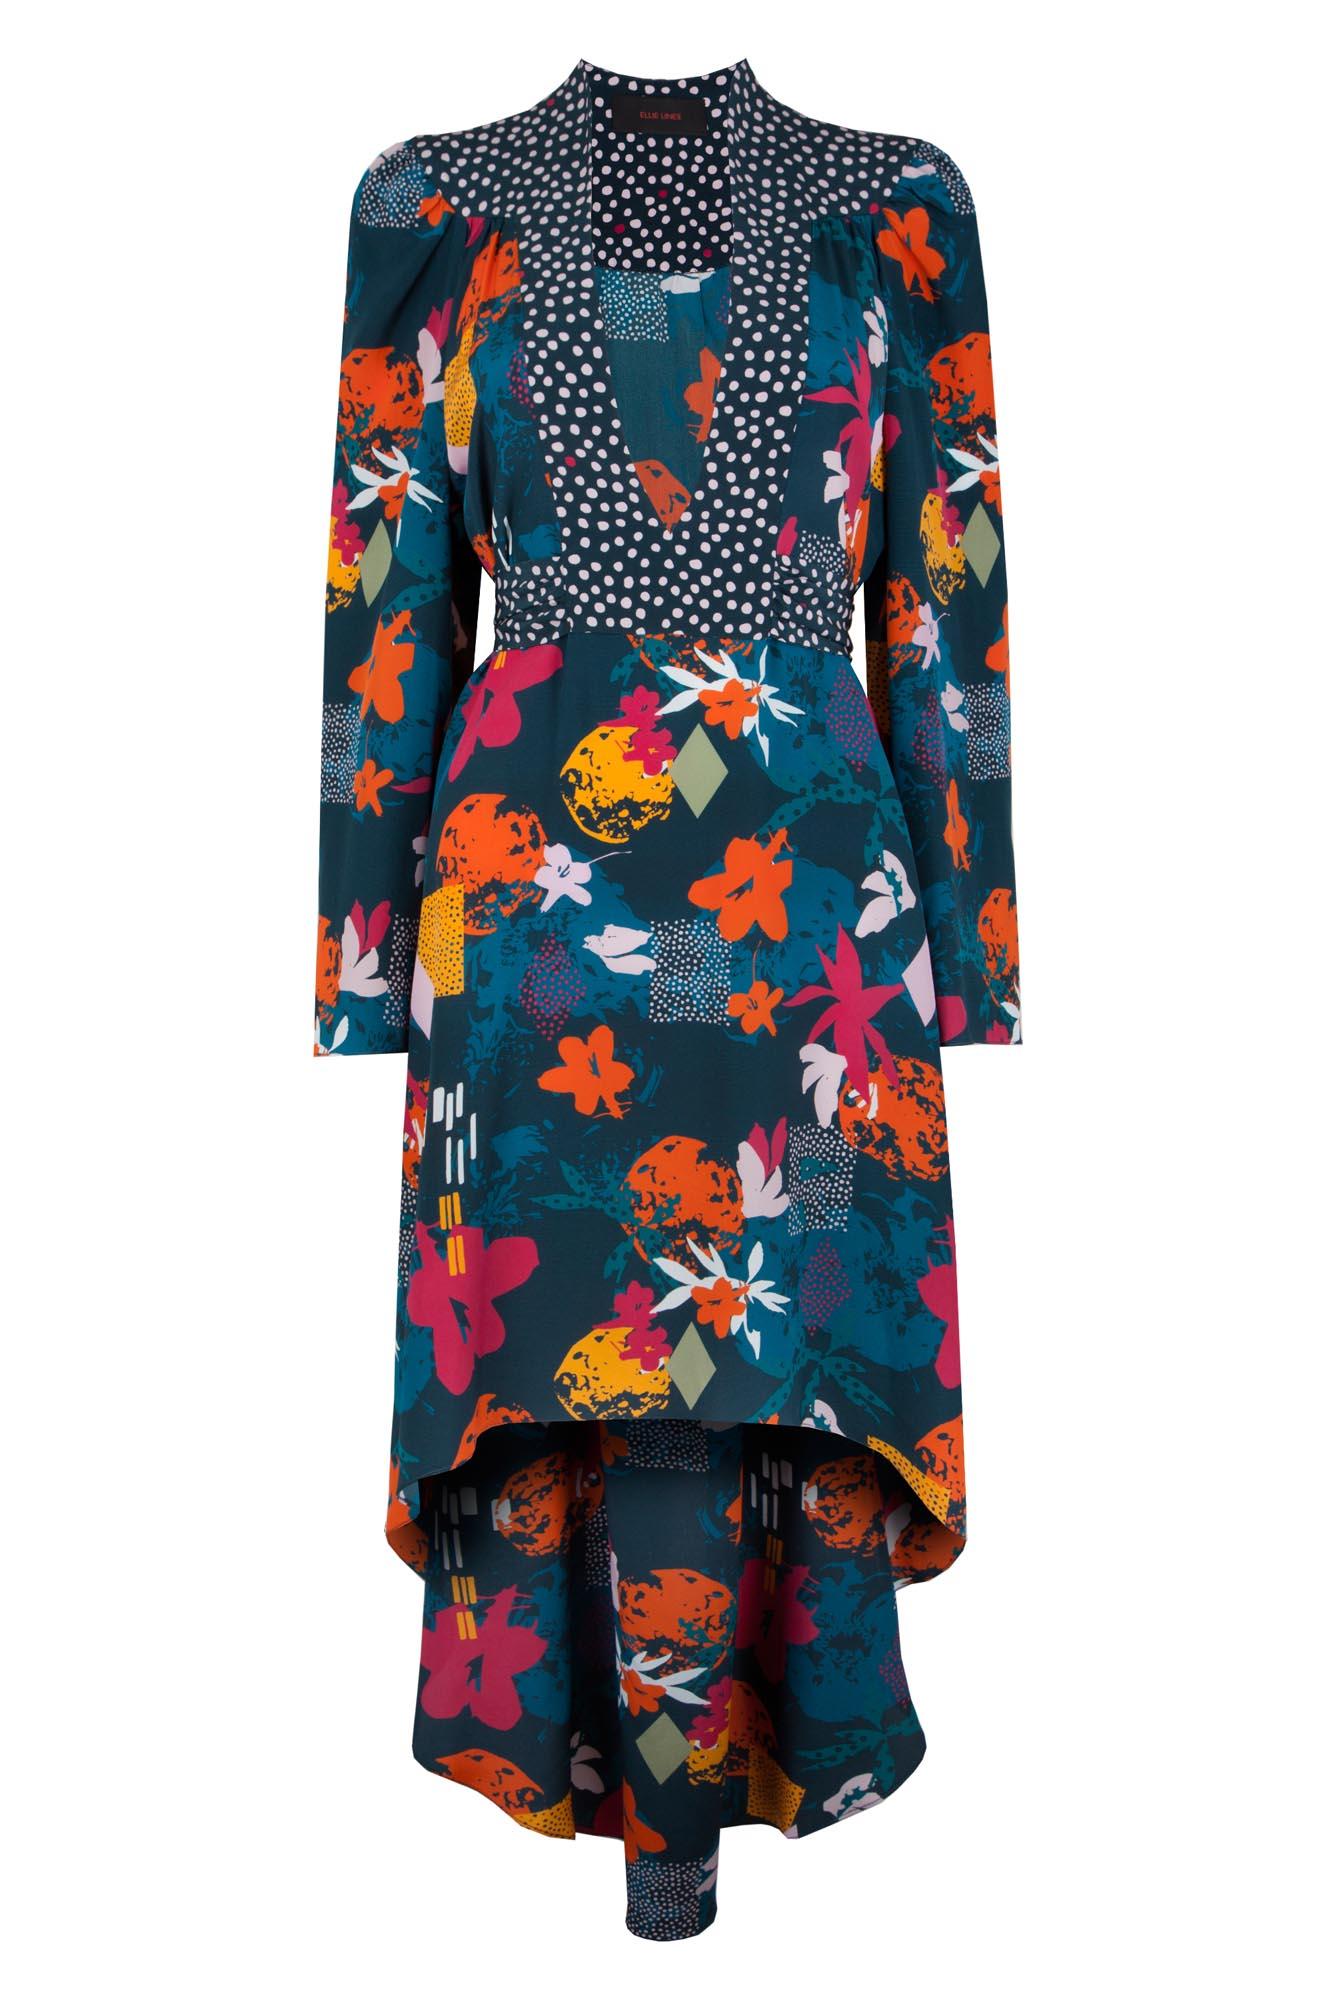 Steph Fruit Play silk dress uk